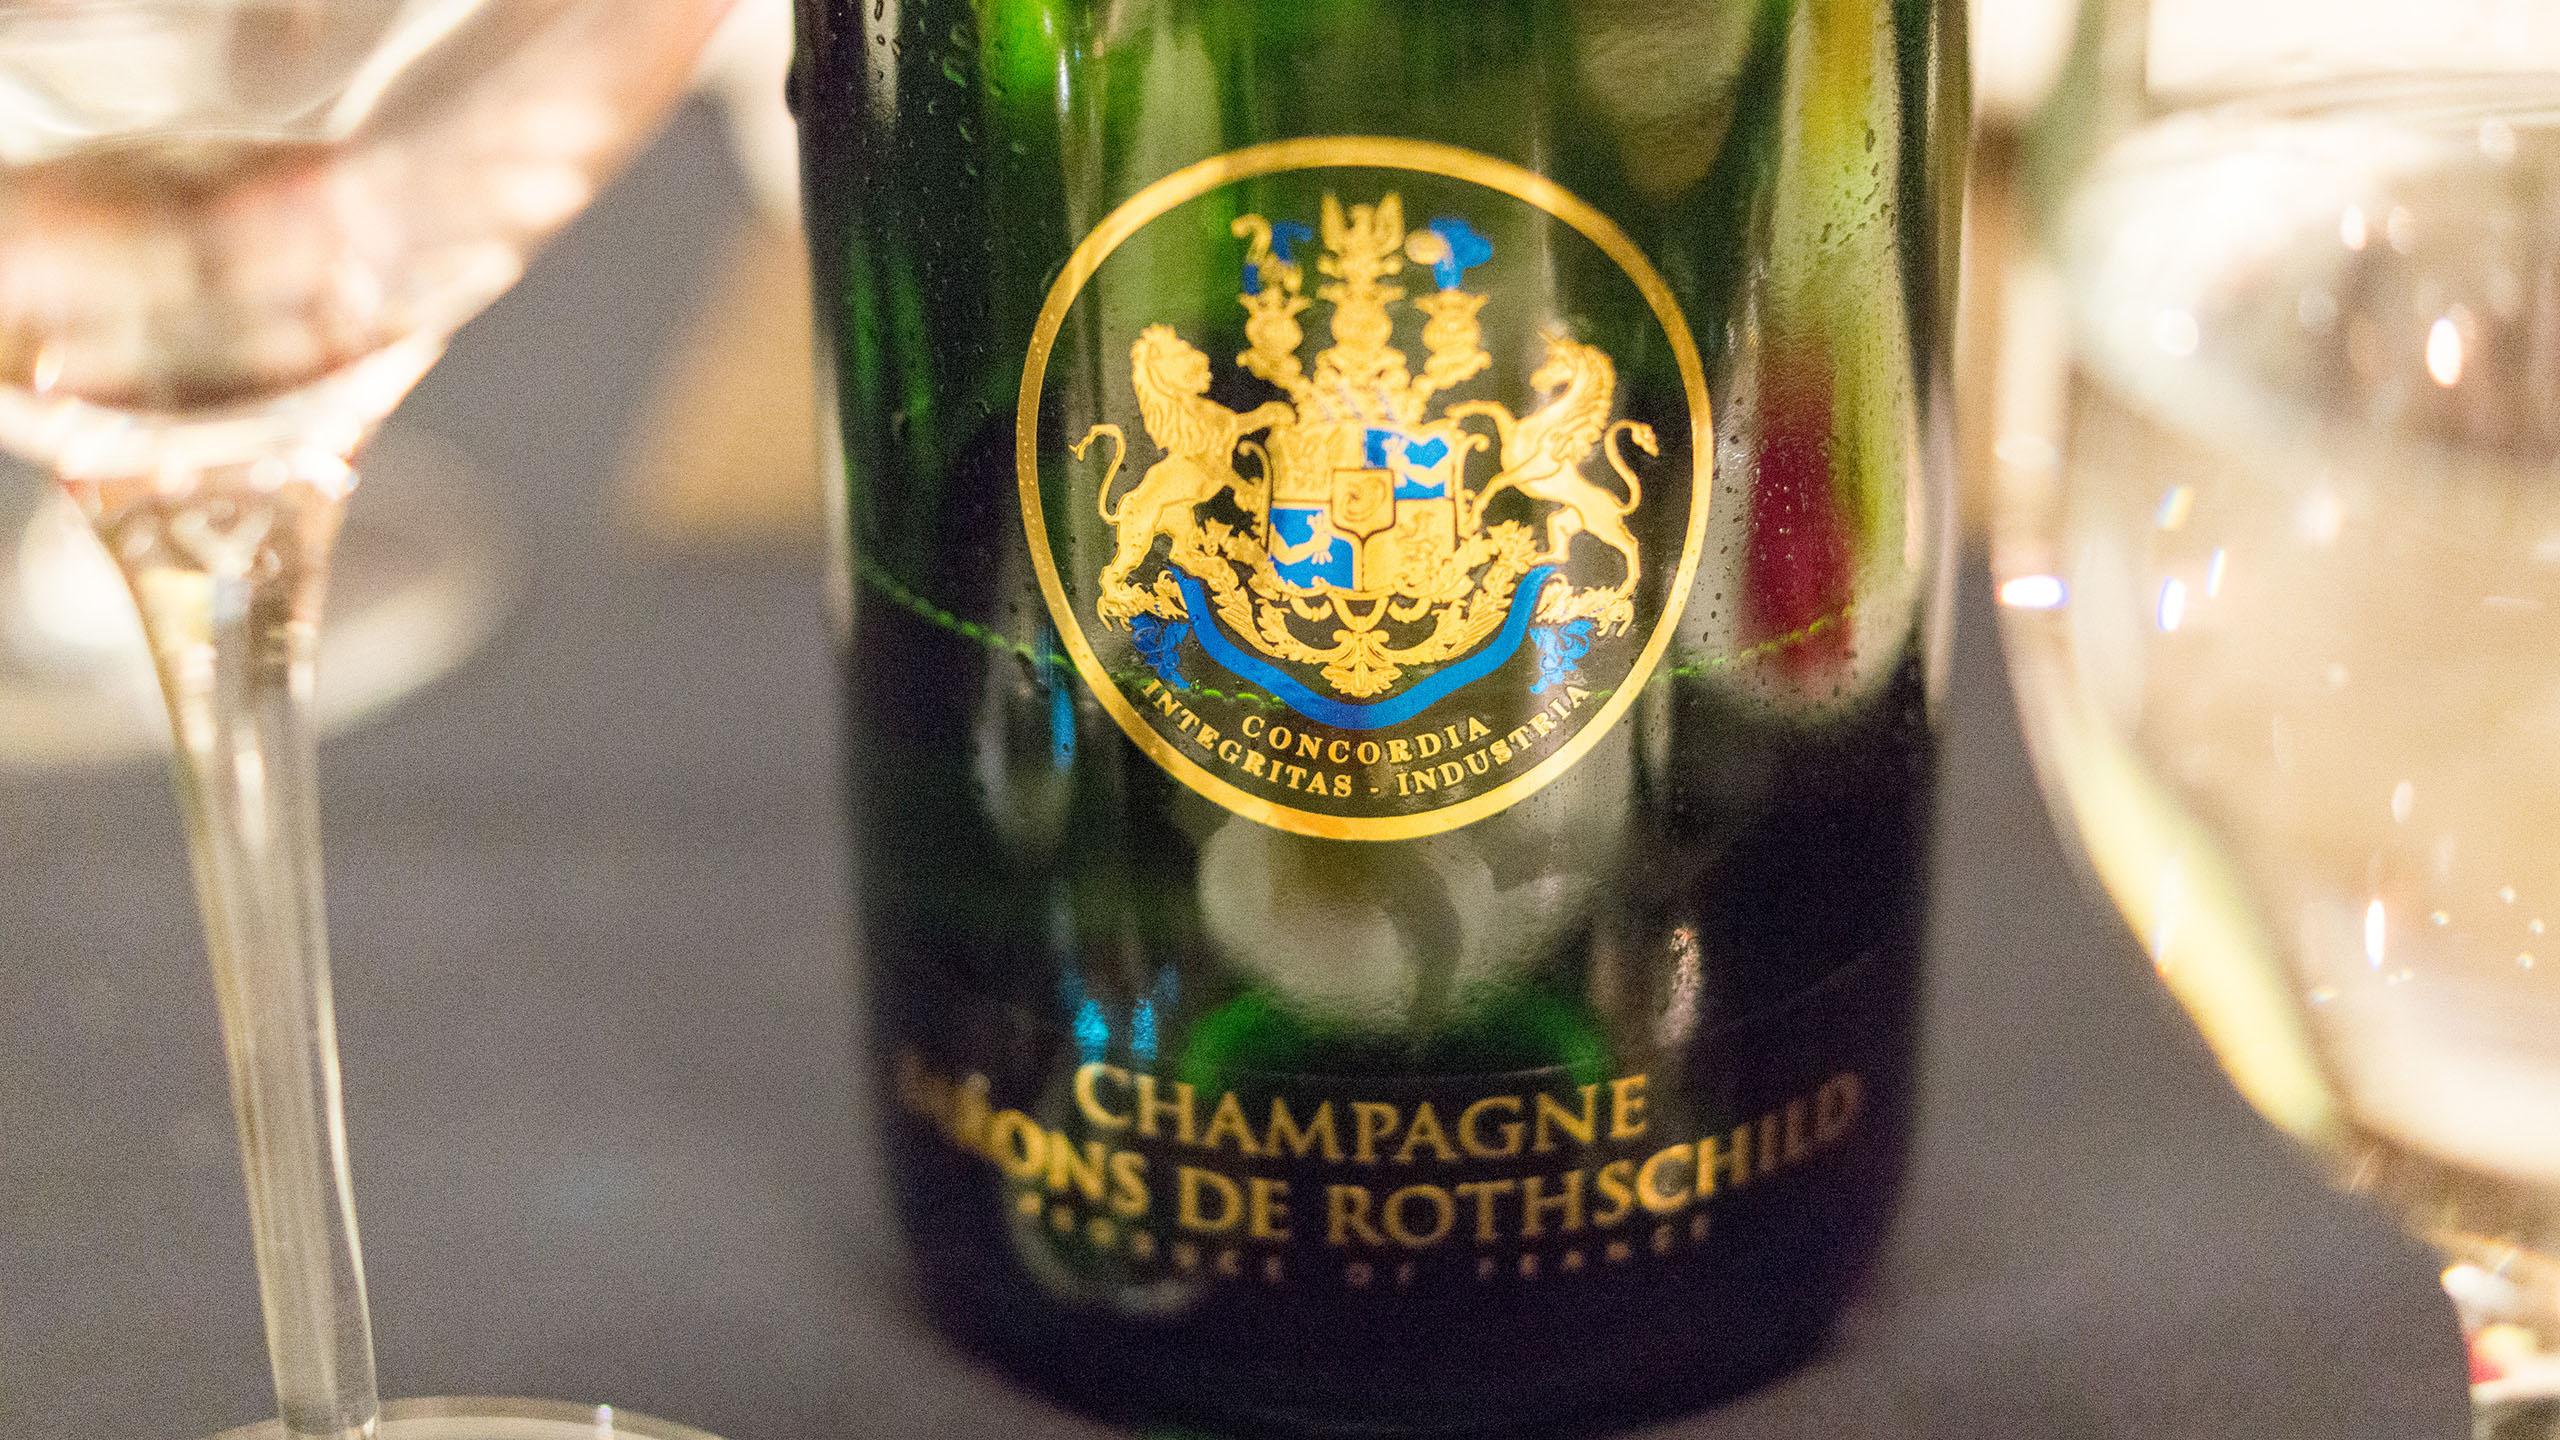 Champagne de Rothschild Blanc de Blanc NV